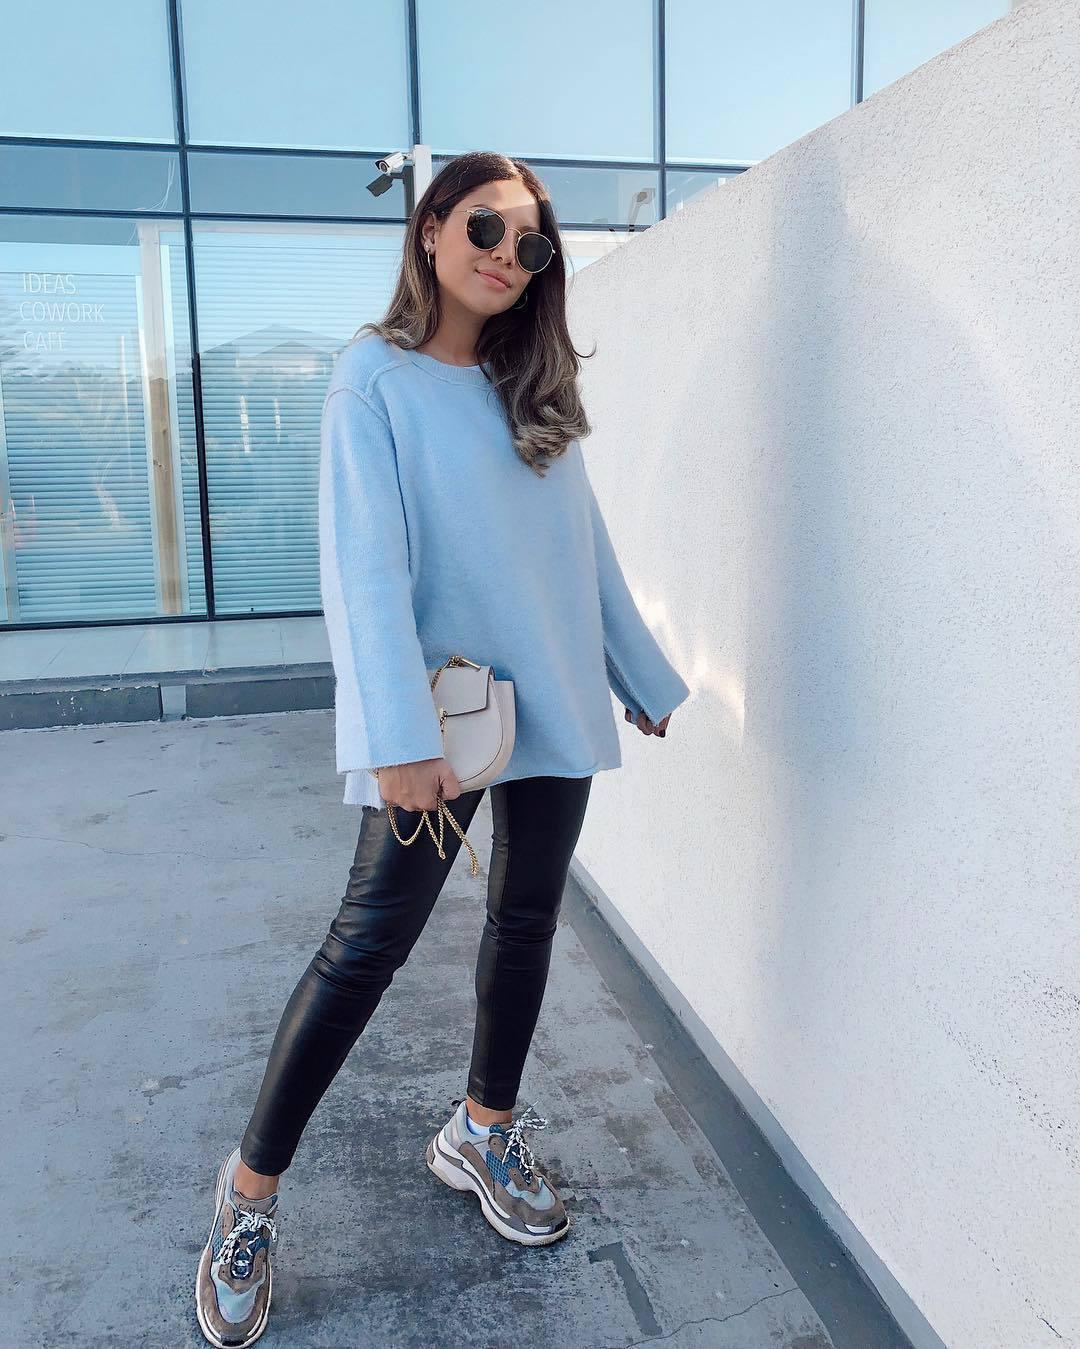 pants black leather pants skinny pants sneakers blue sweater zara oversized sweater white bag